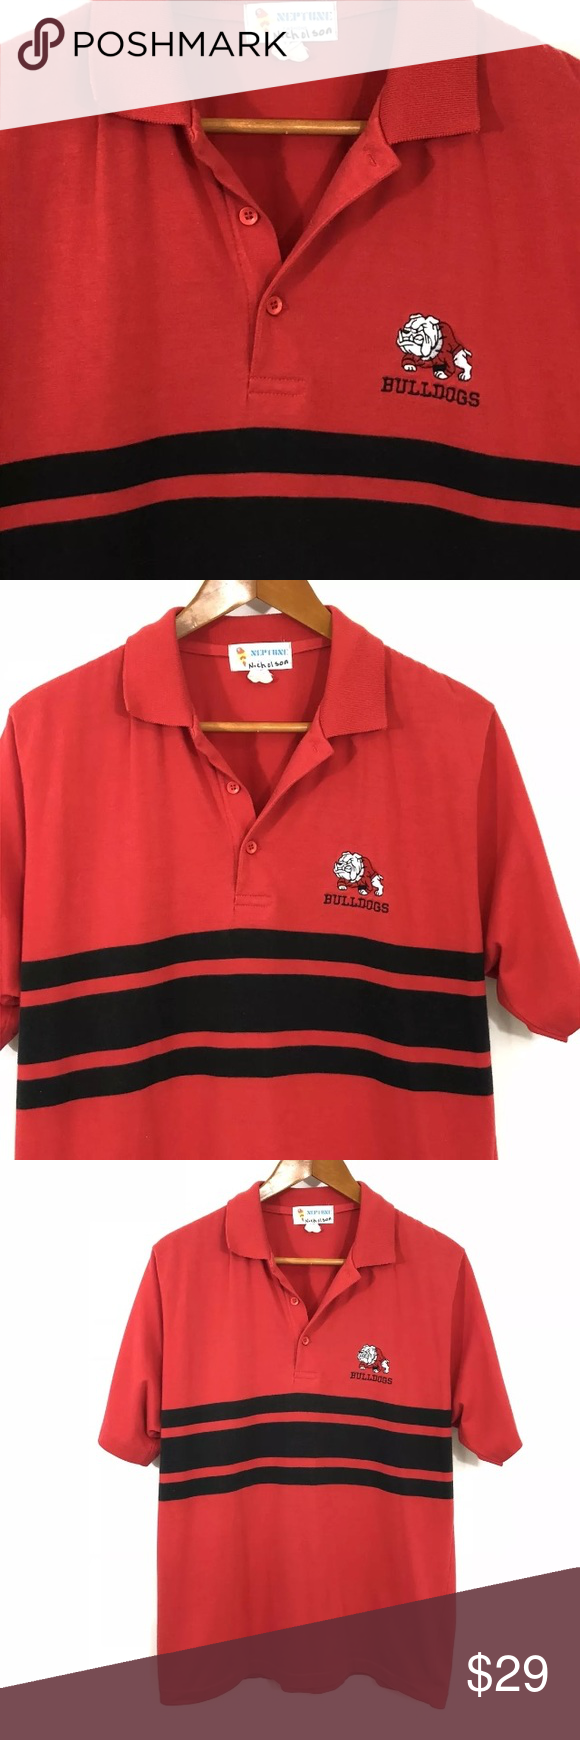 Vintage Uga Polo Shirt 70s 80s Univ Of Florida Vintage University Of